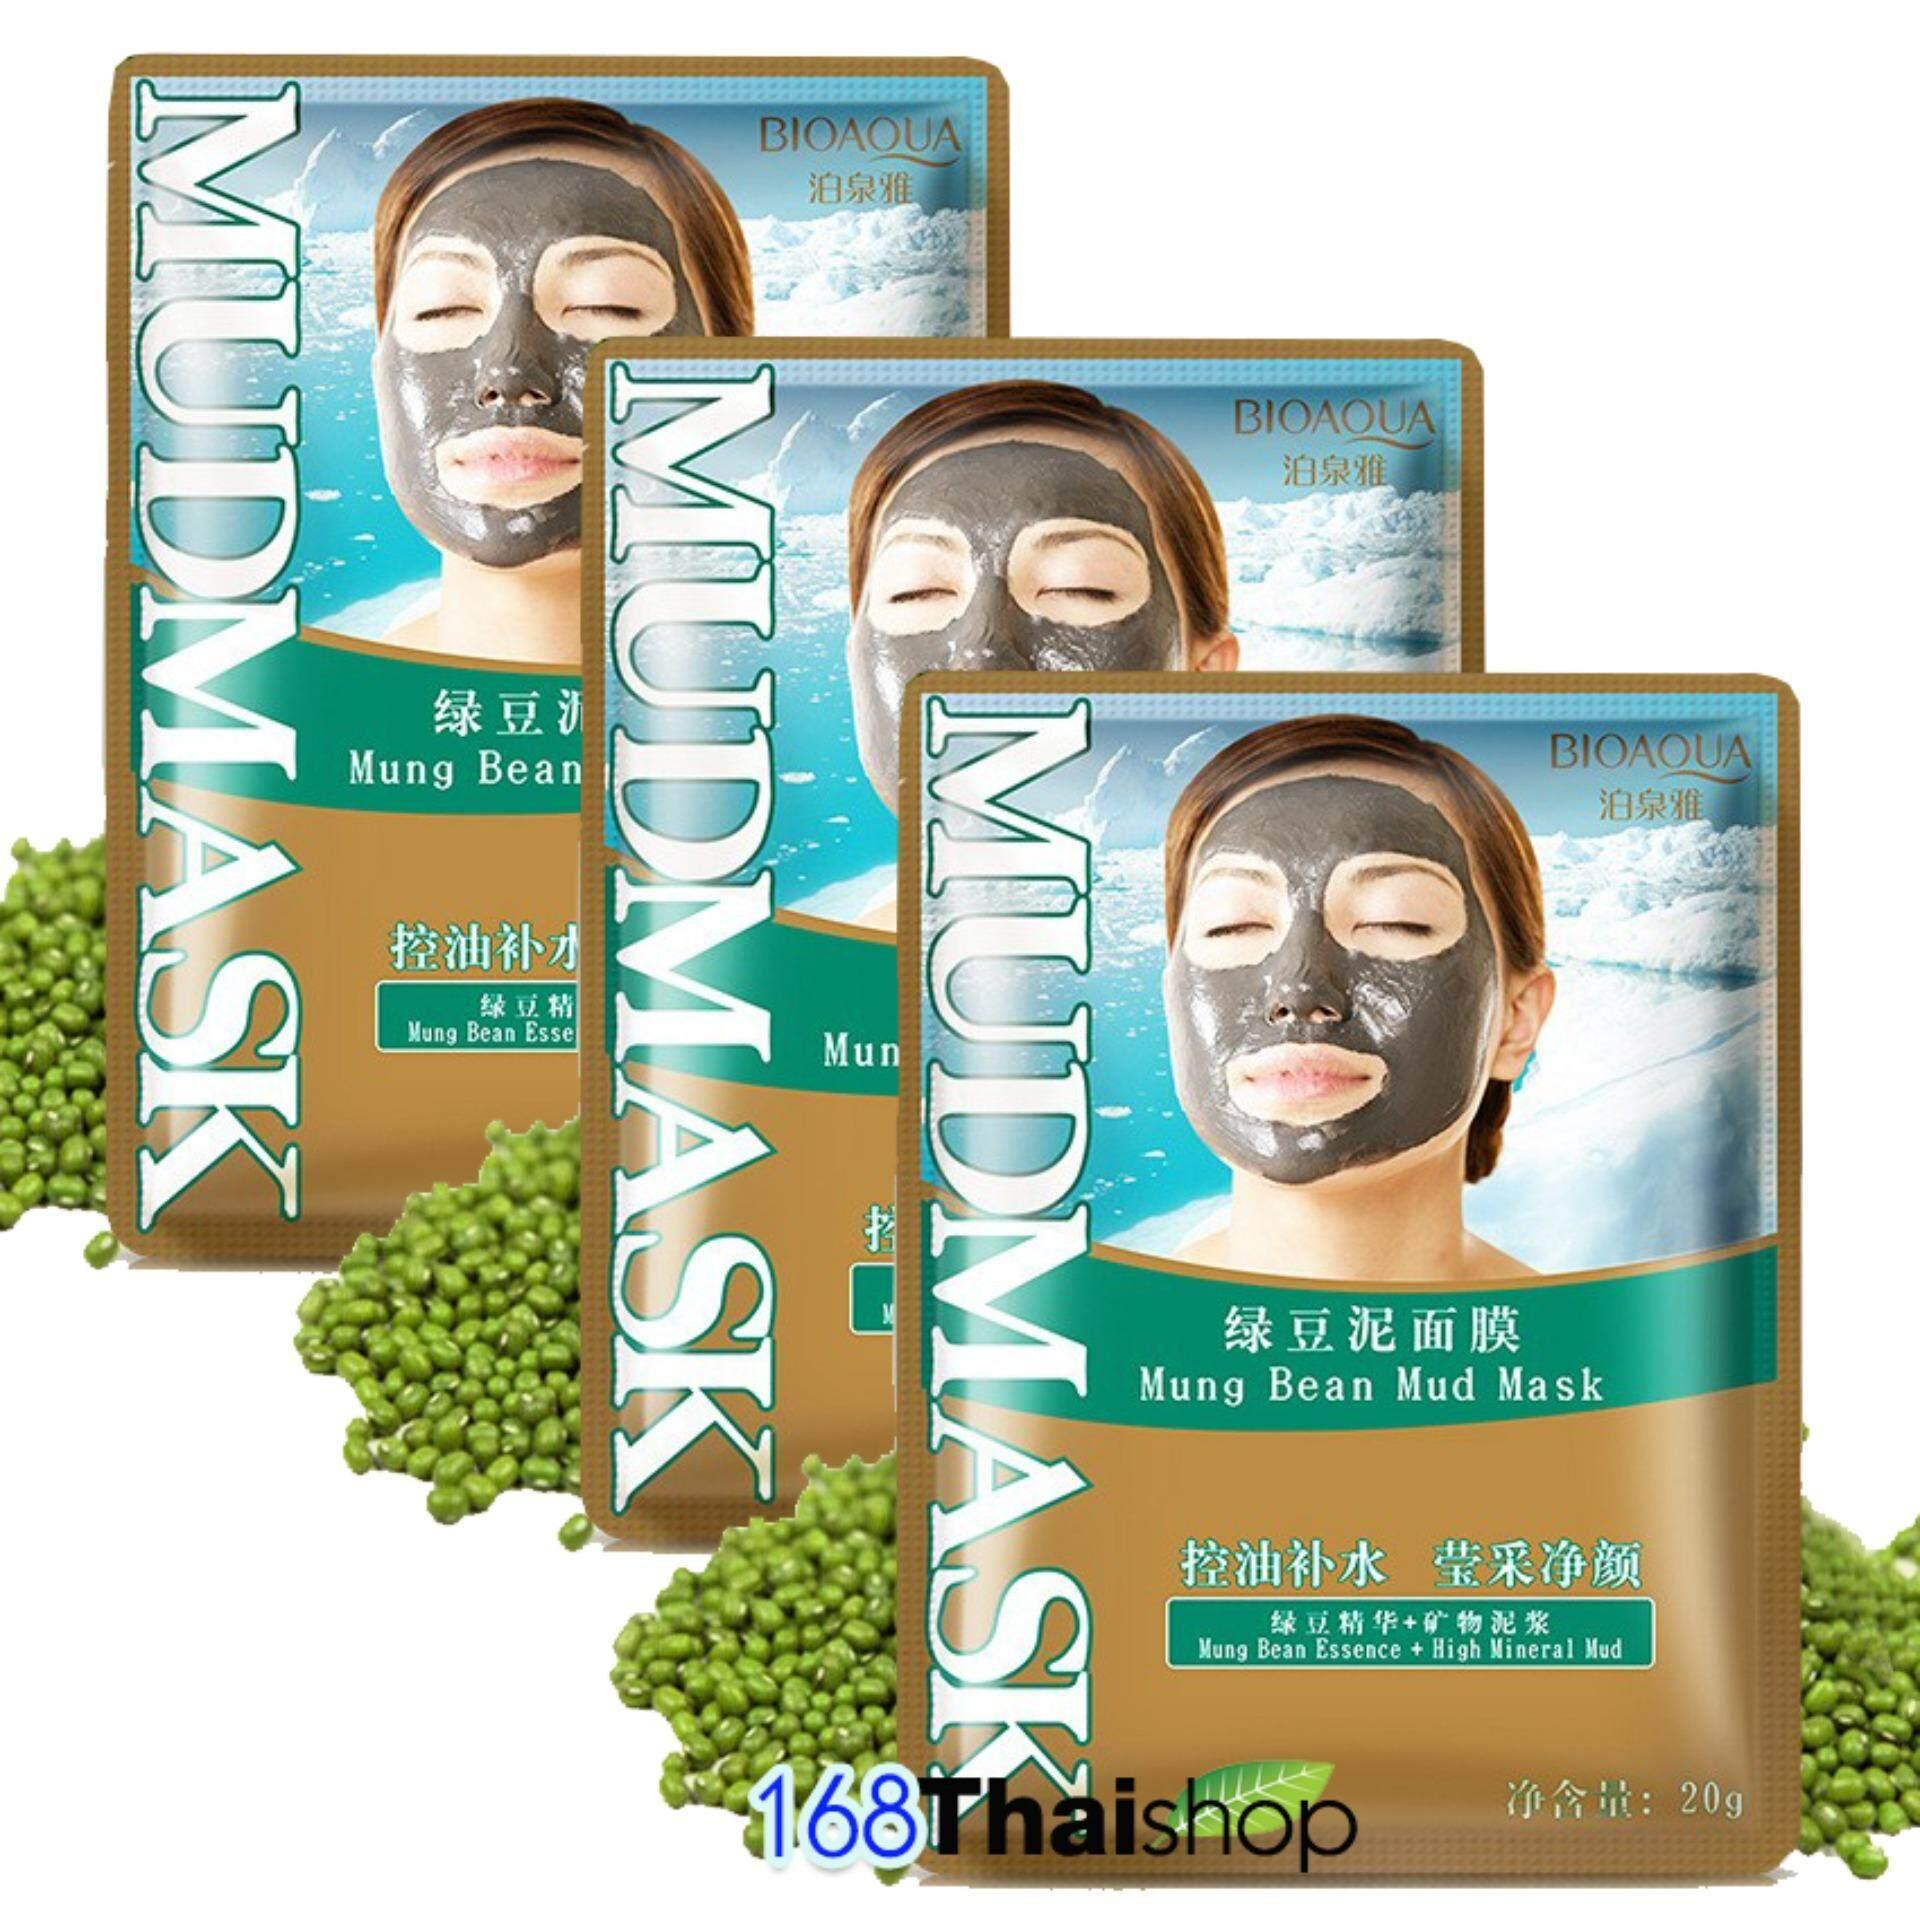 Bioaqua Mung Bean Mud Mask มาส์กโคลนพอกหน้าถั่วเขียว ให้ความชุ่มชื้นป้องกันสิวกำจัด Blackhead ซองละ 20 G. X ( 3 ห่อ ).